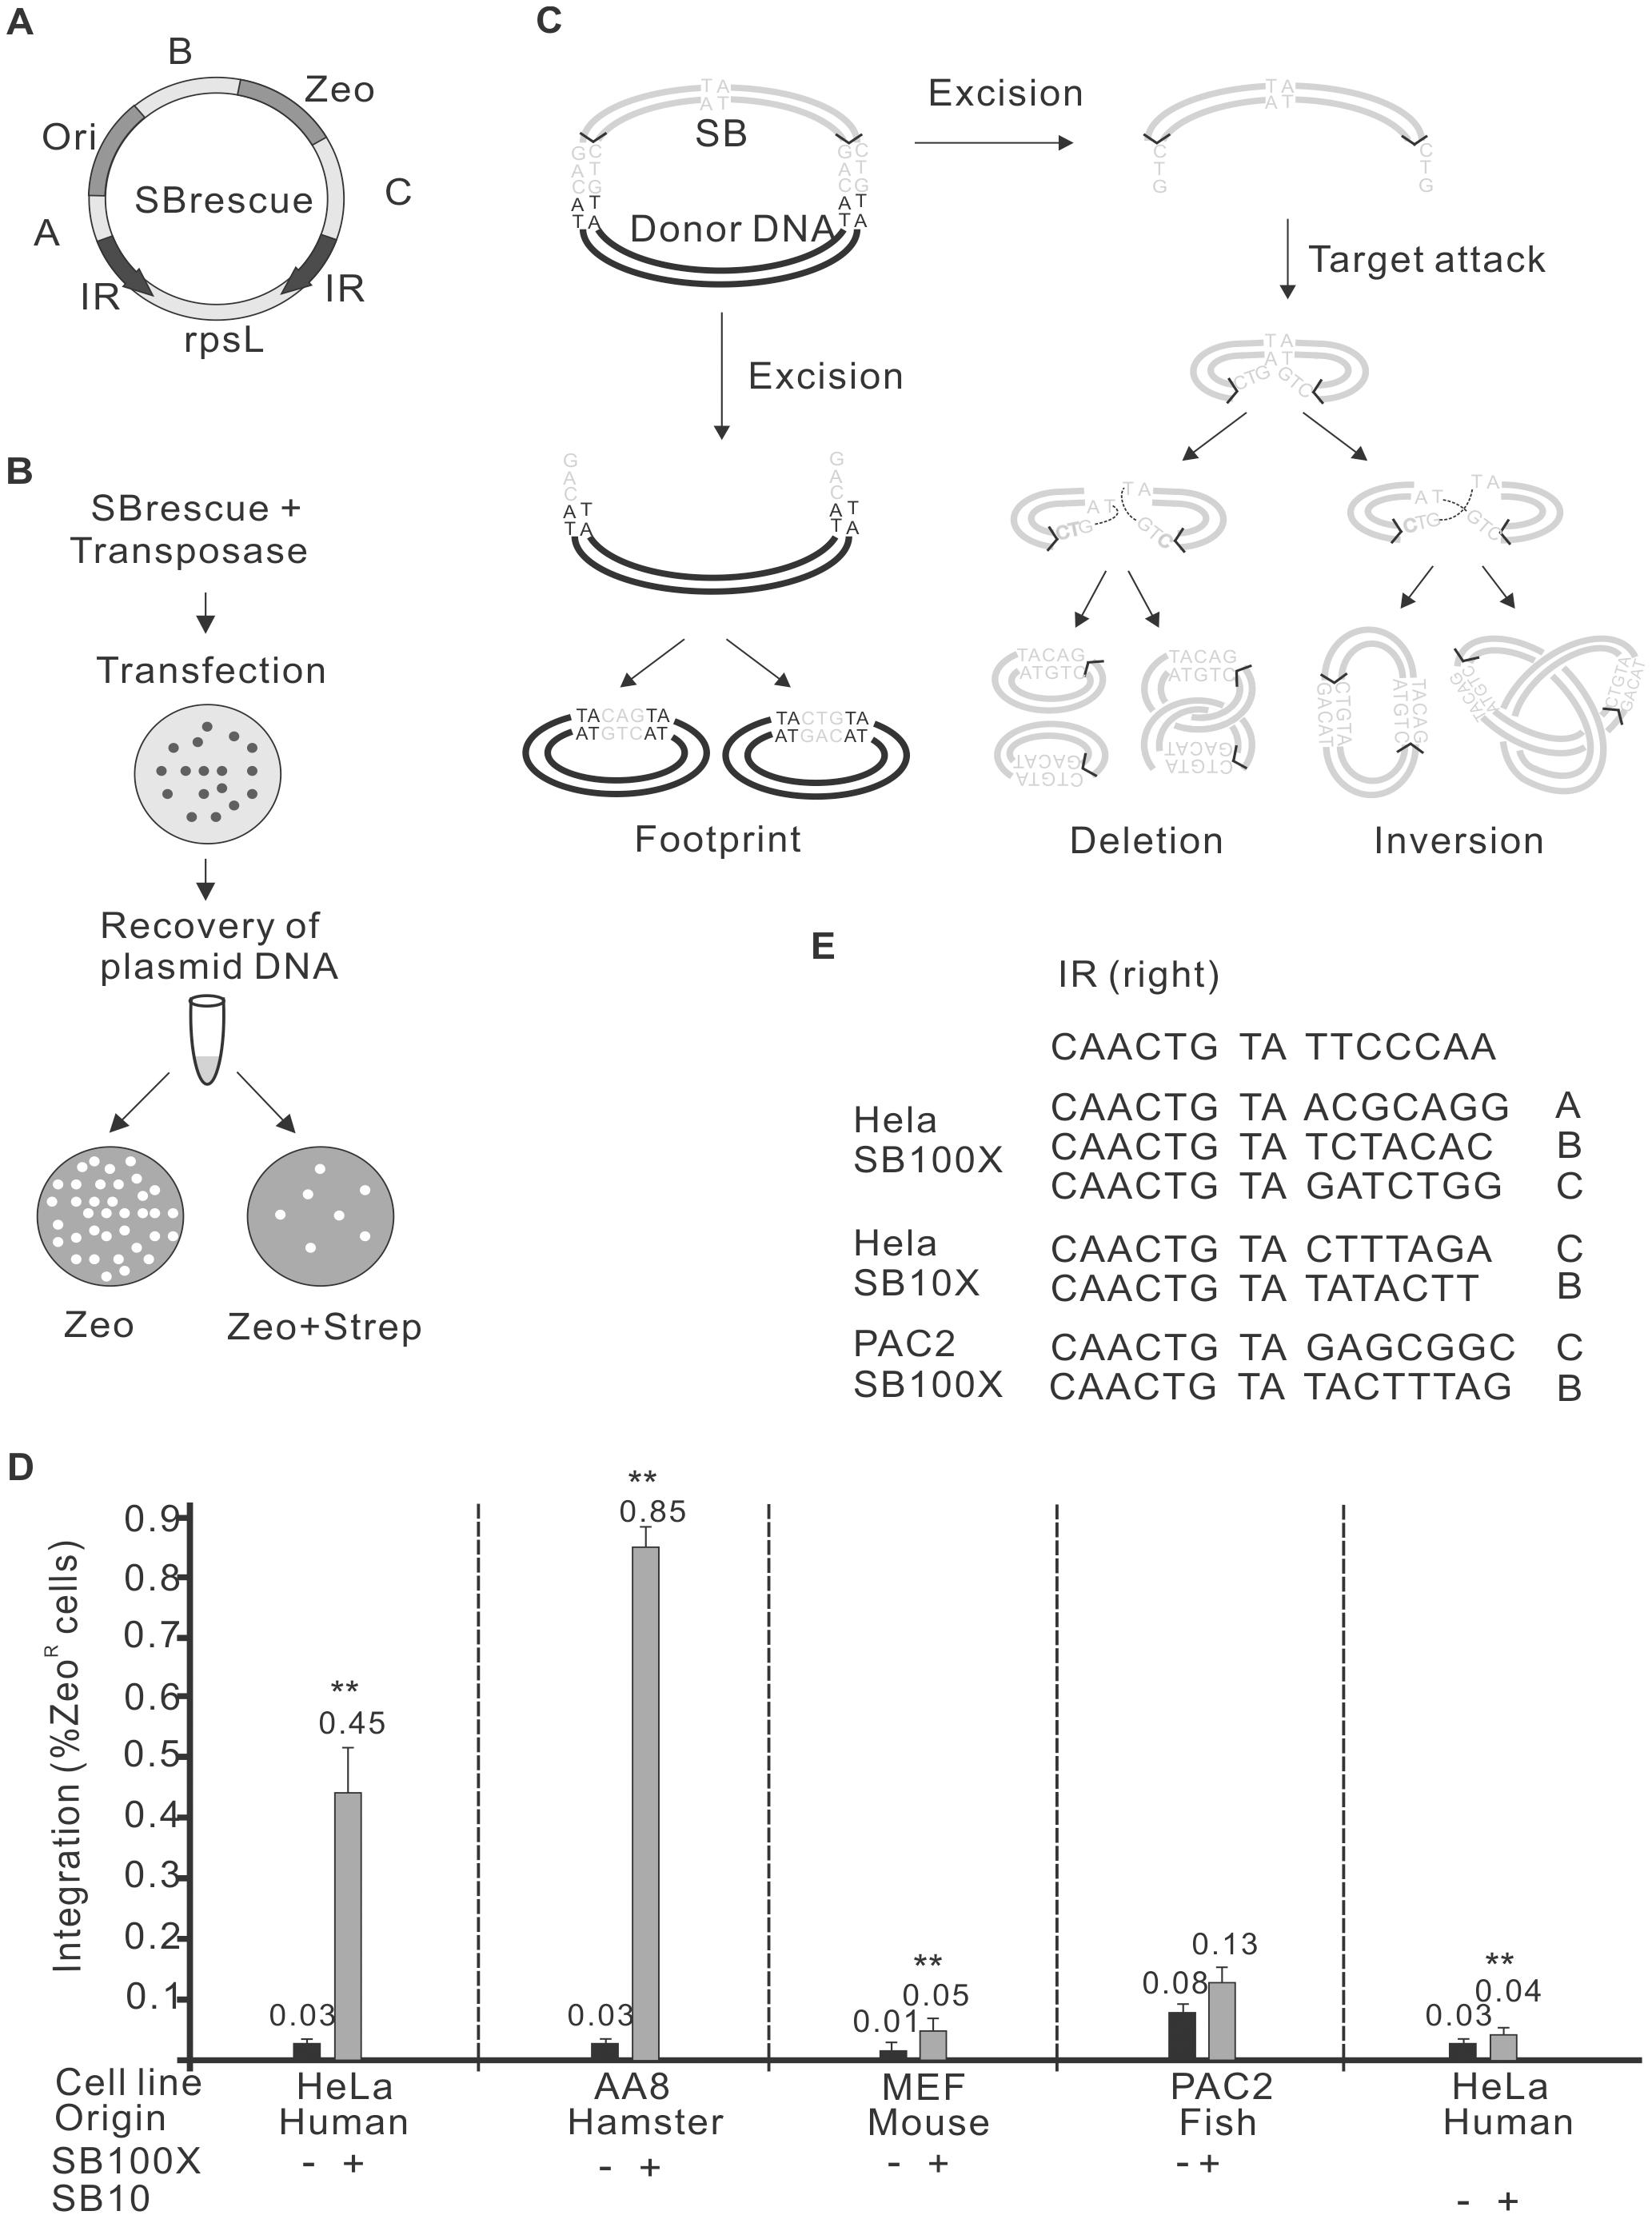 Autointegration of <i>SB</i> transposon.